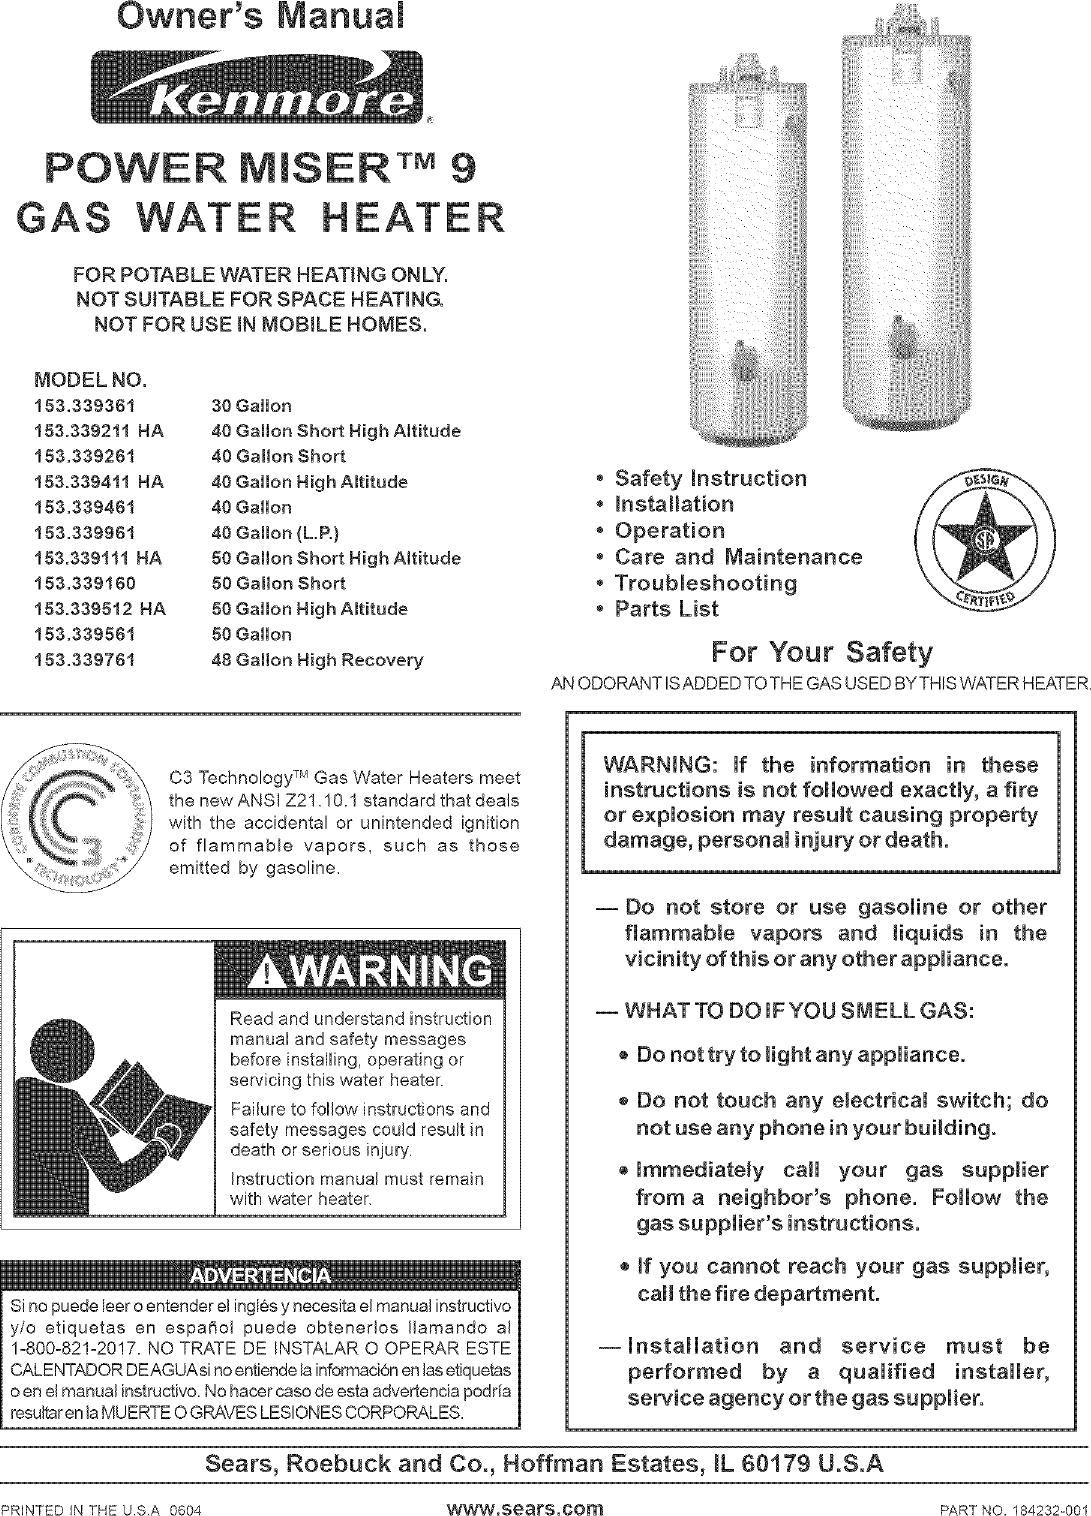 Backdrafting Water Heaters Manual Guide